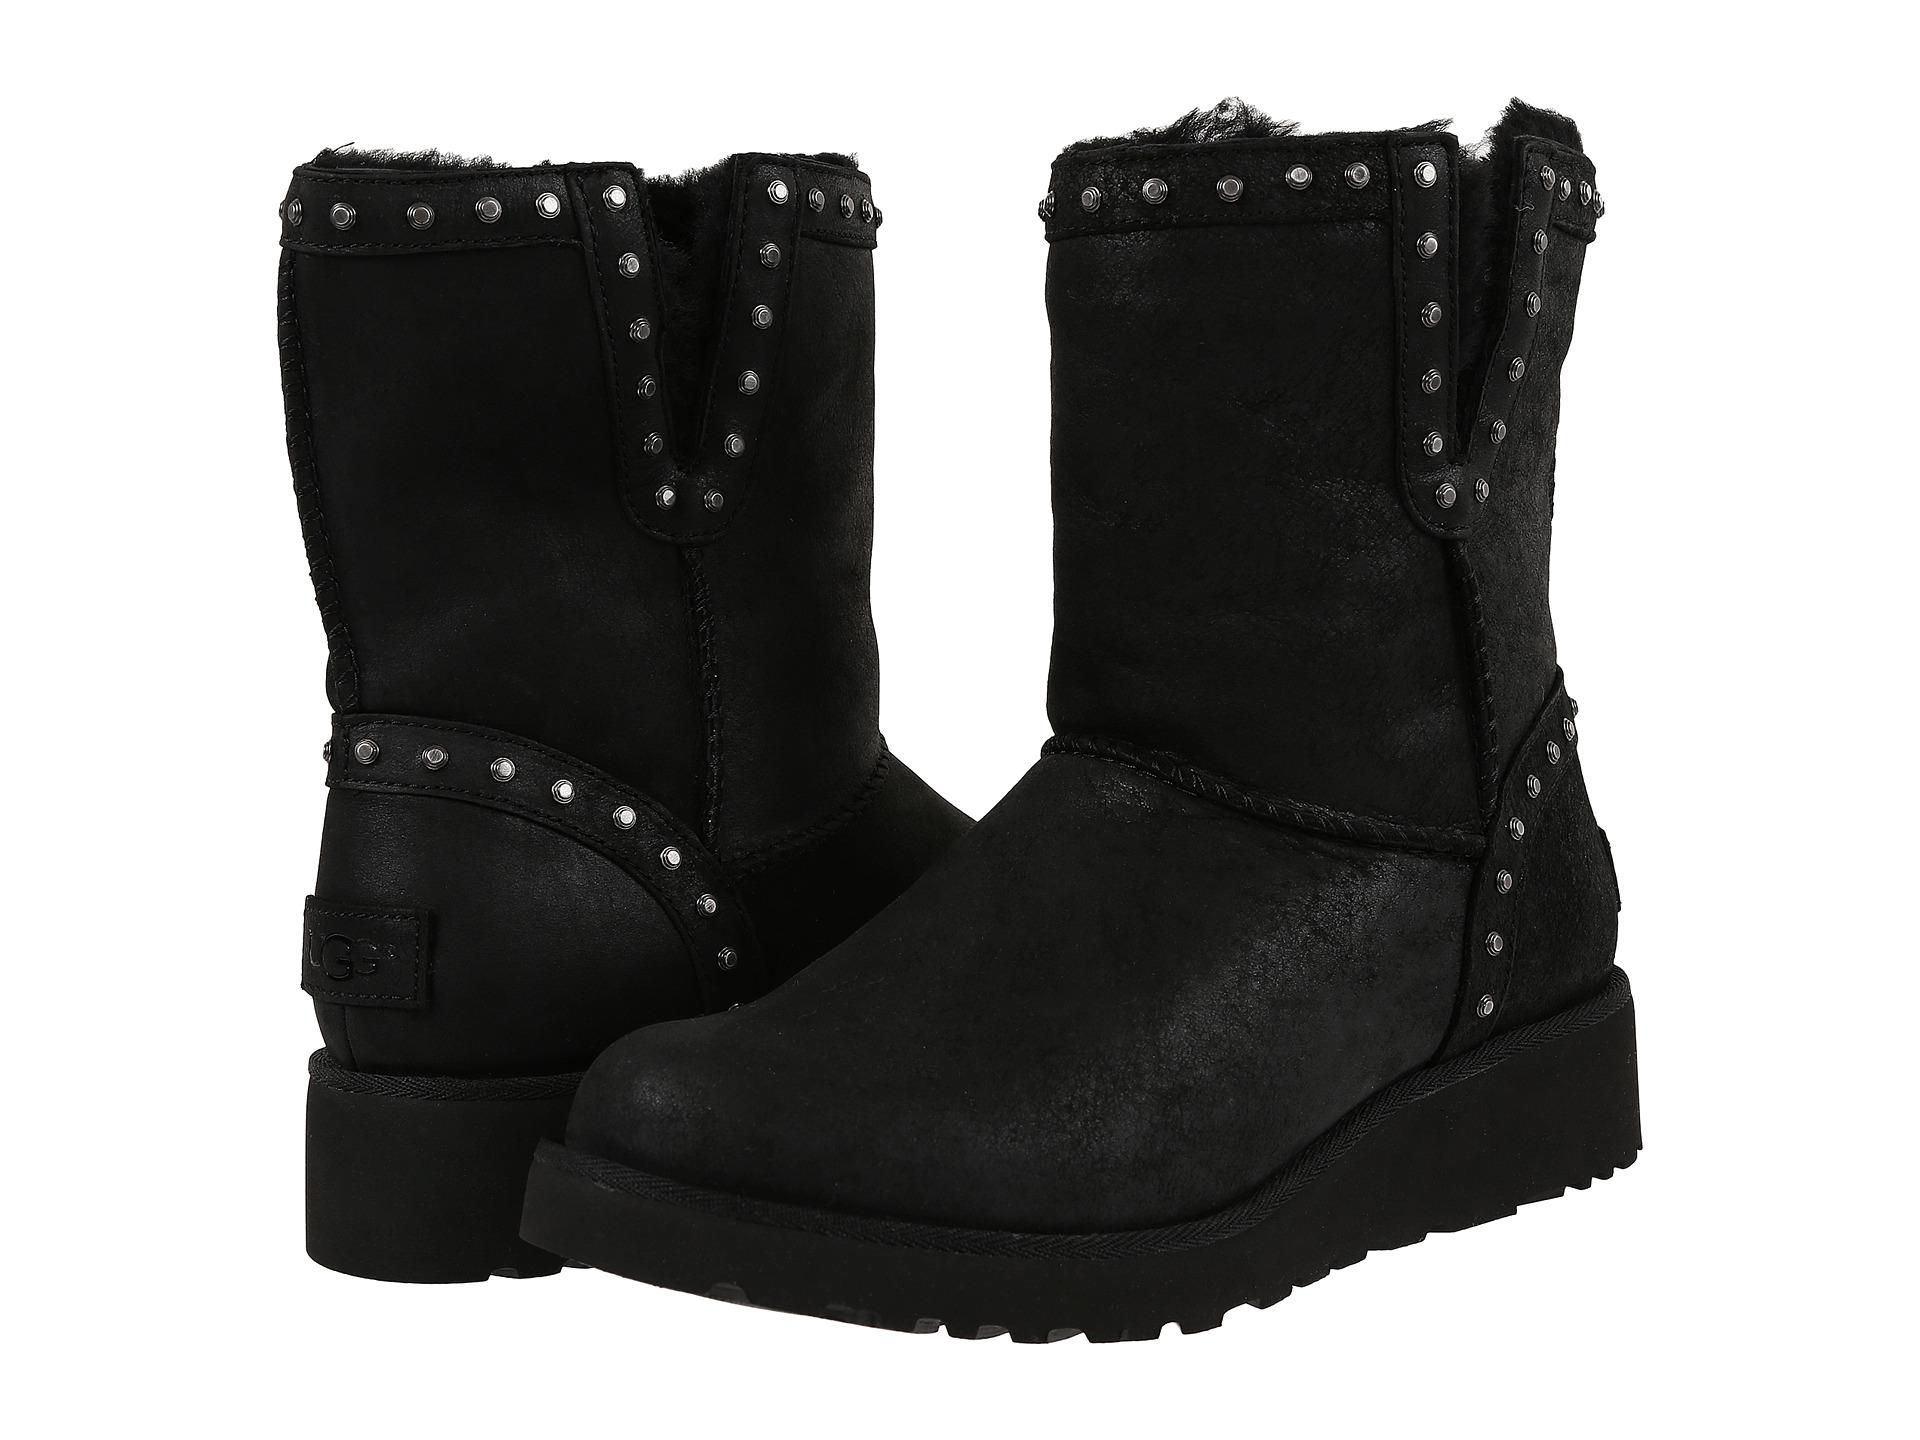 5d14485a3d7 Junior Leather Ugg Boots - cheap watches mgc-gas.com